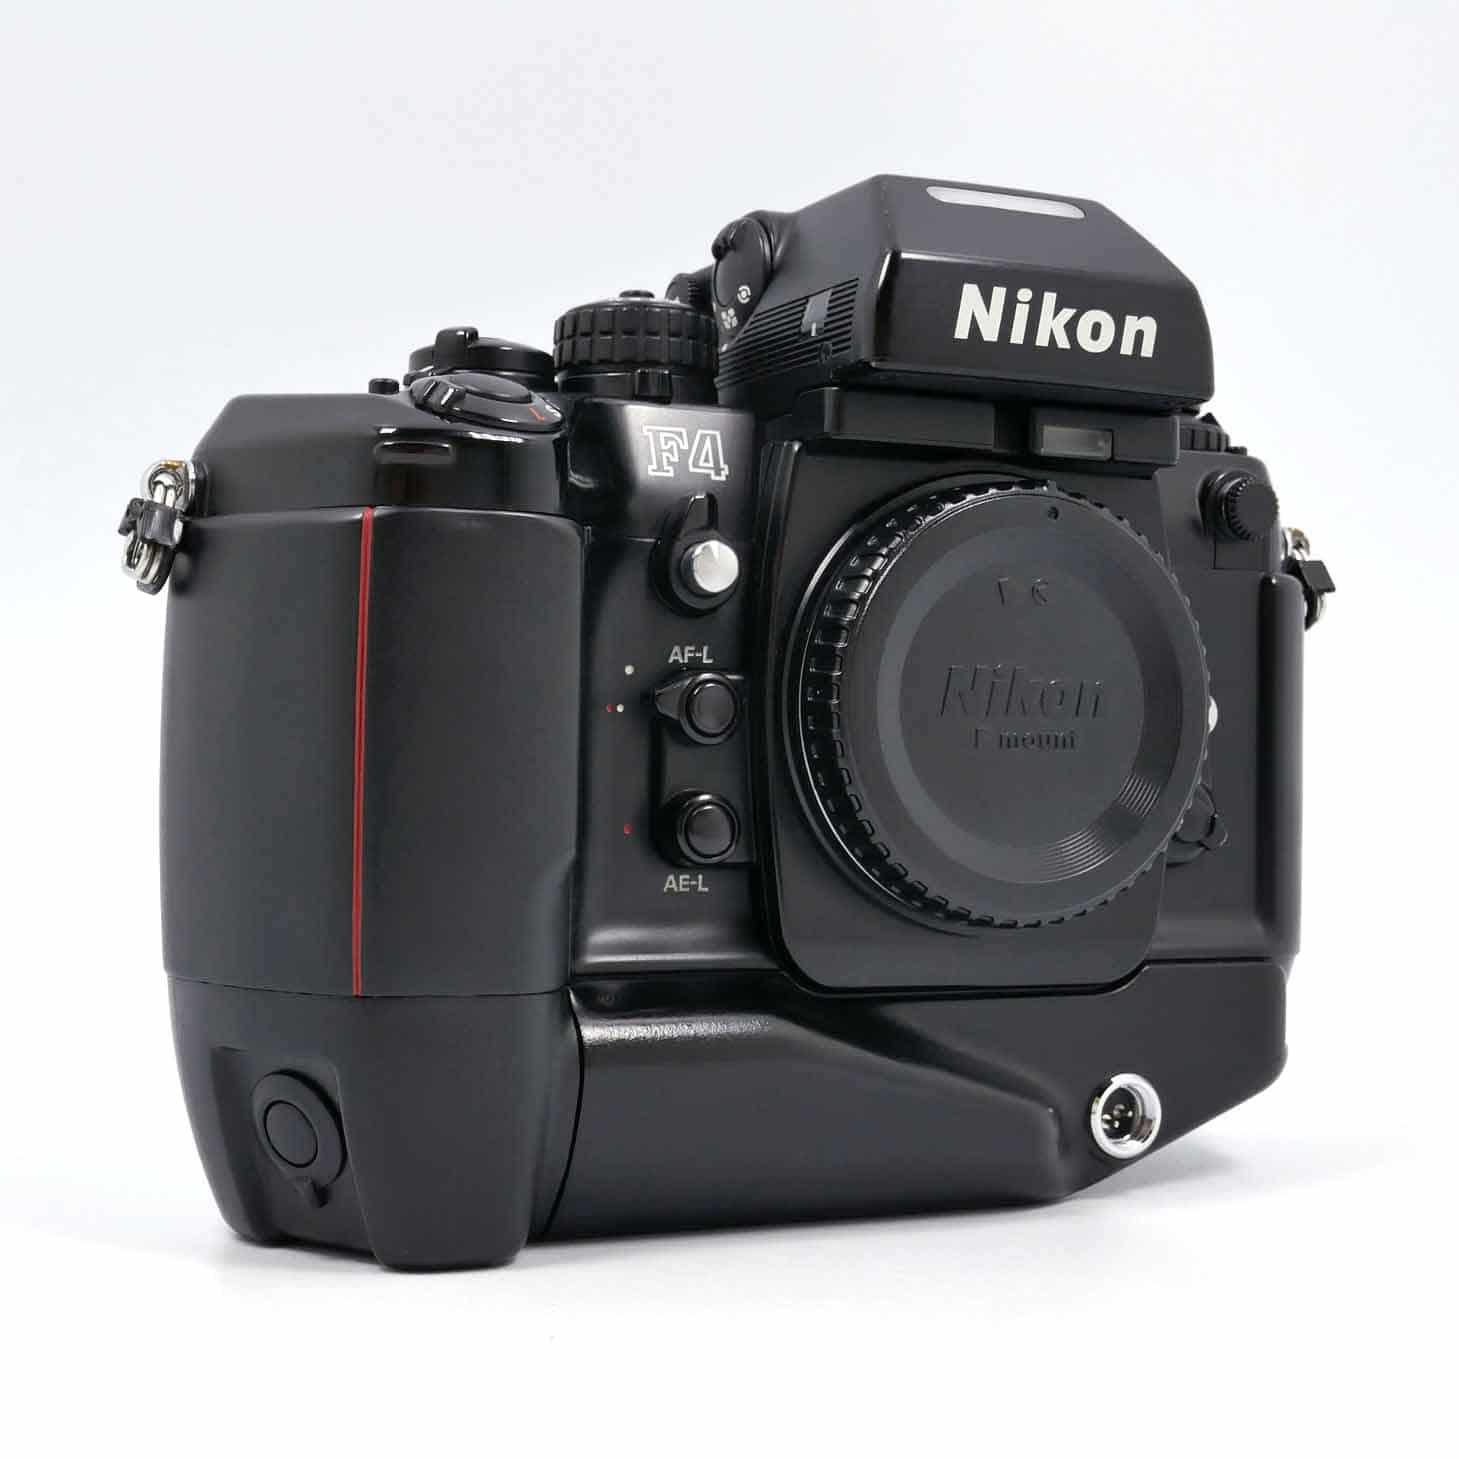 clean-cameras-Nikon-F4-+Nikon--MB-21-08